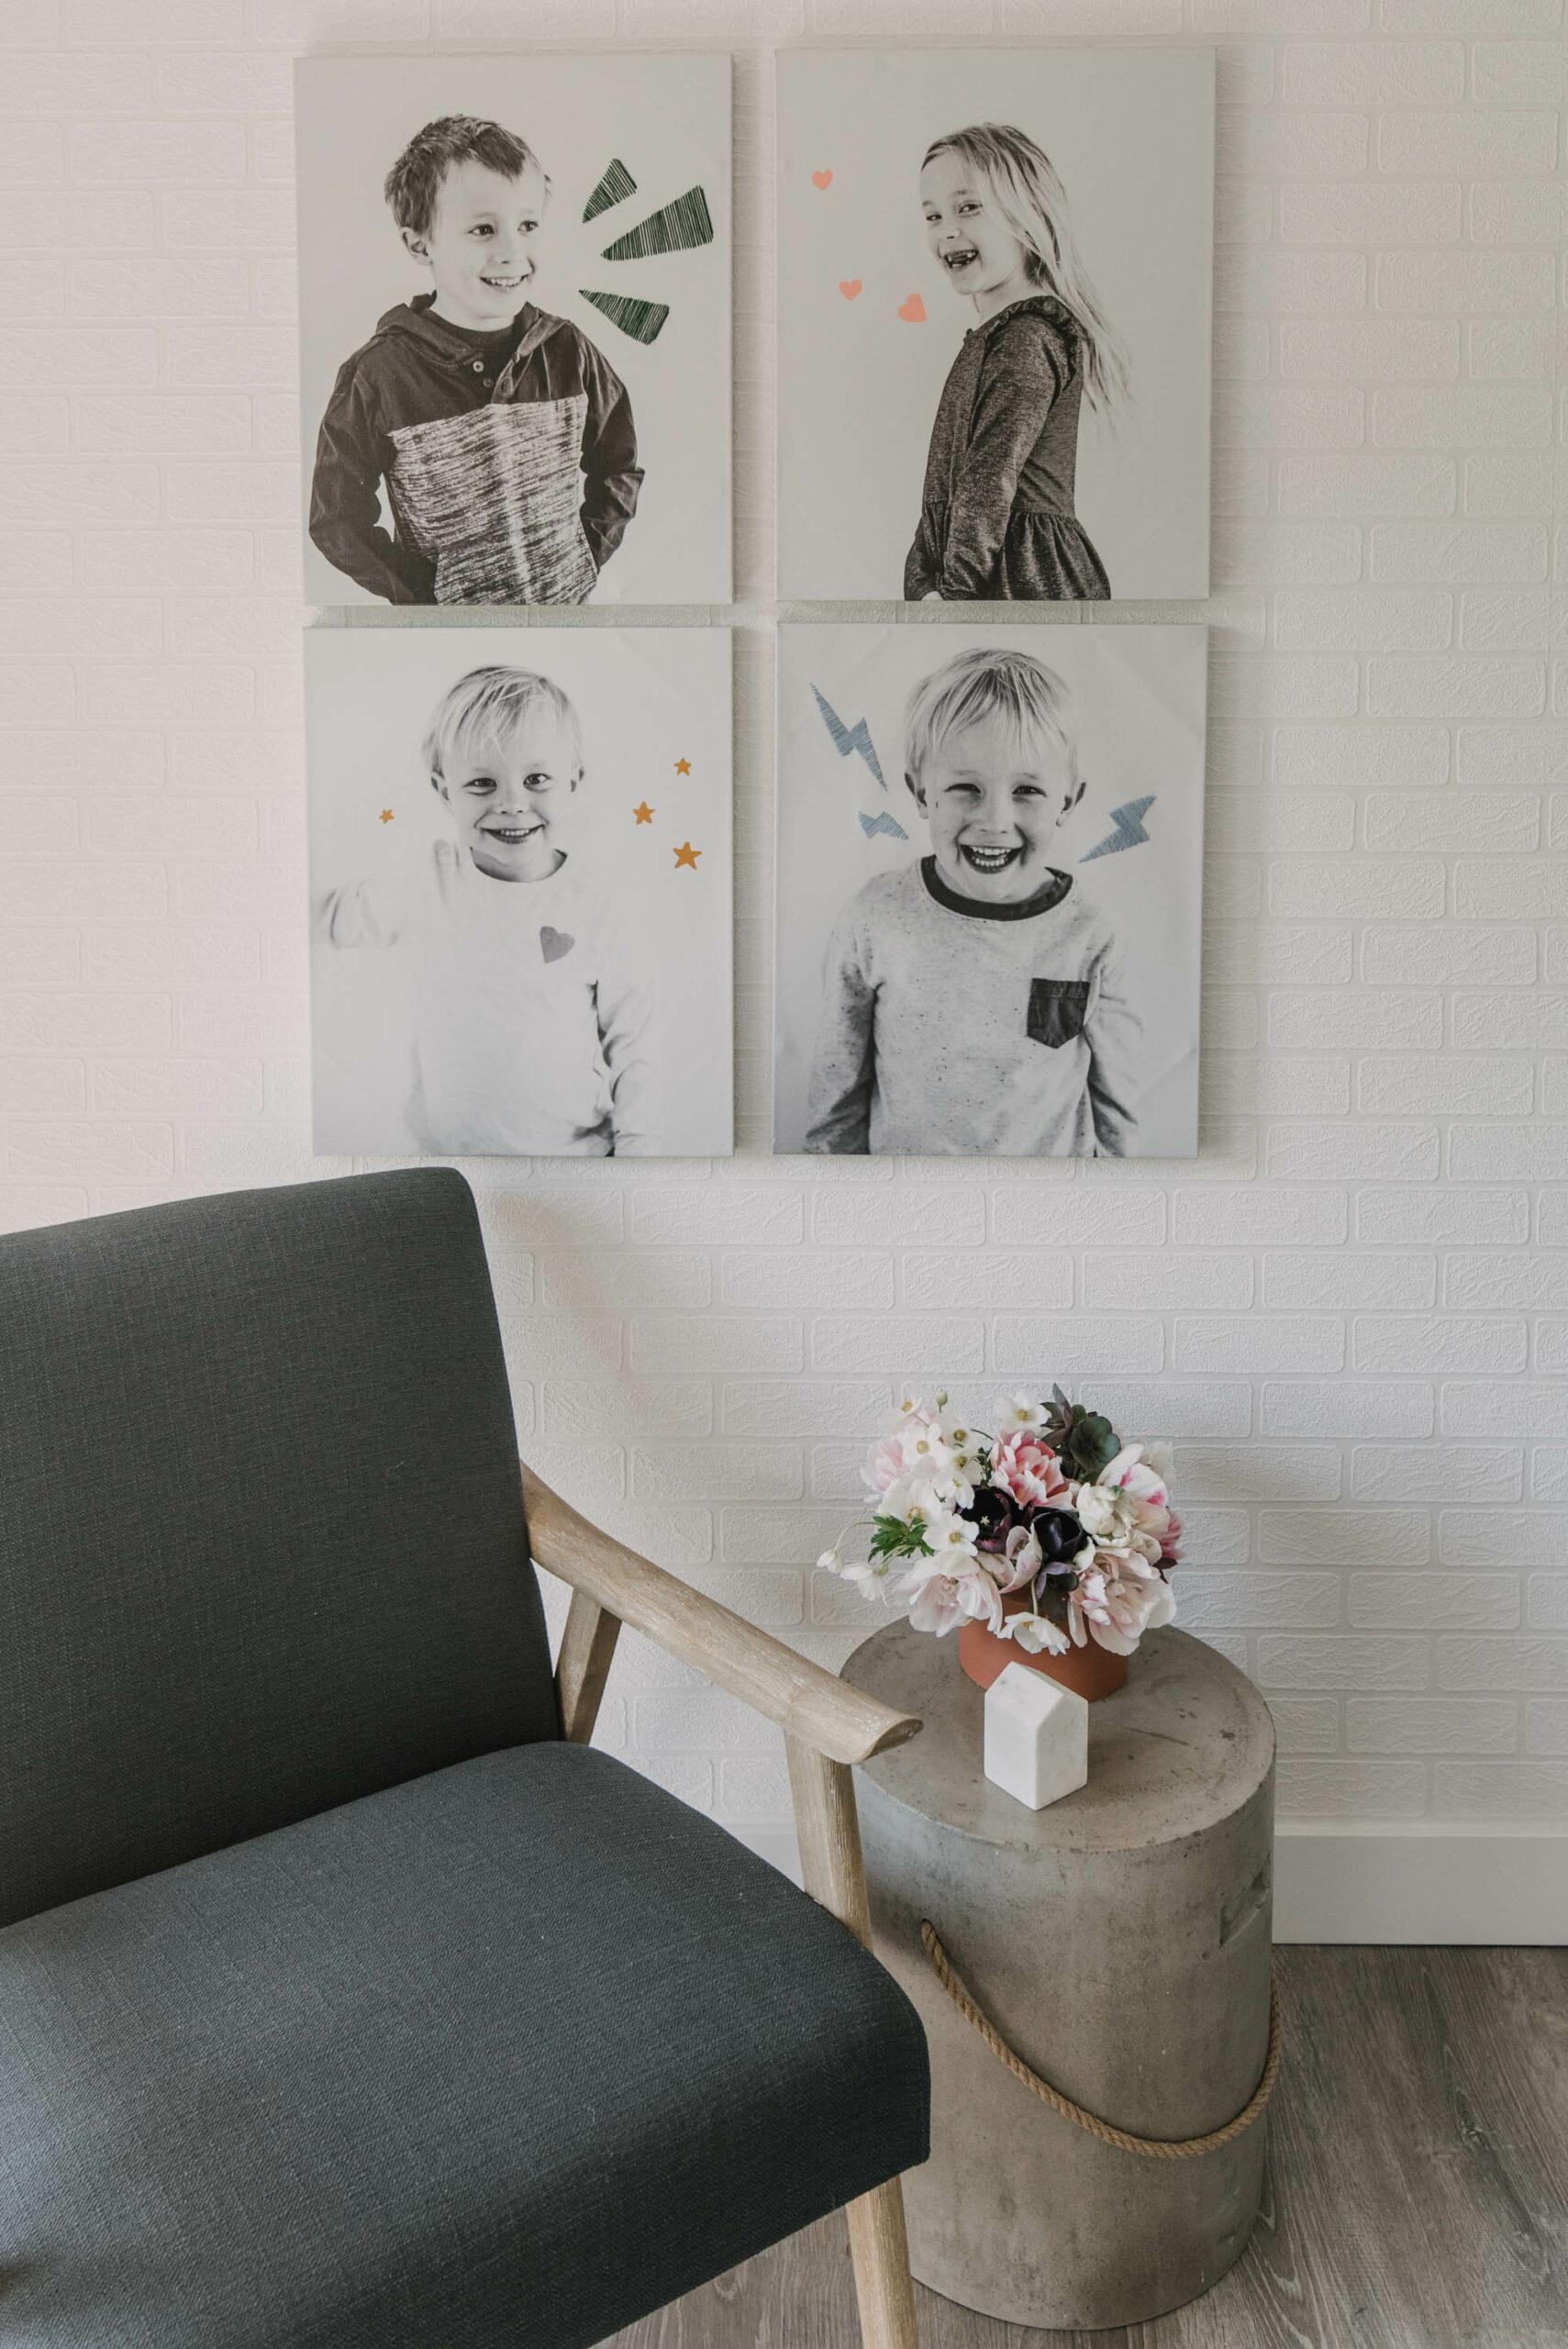 Adding fun color to black and white photos